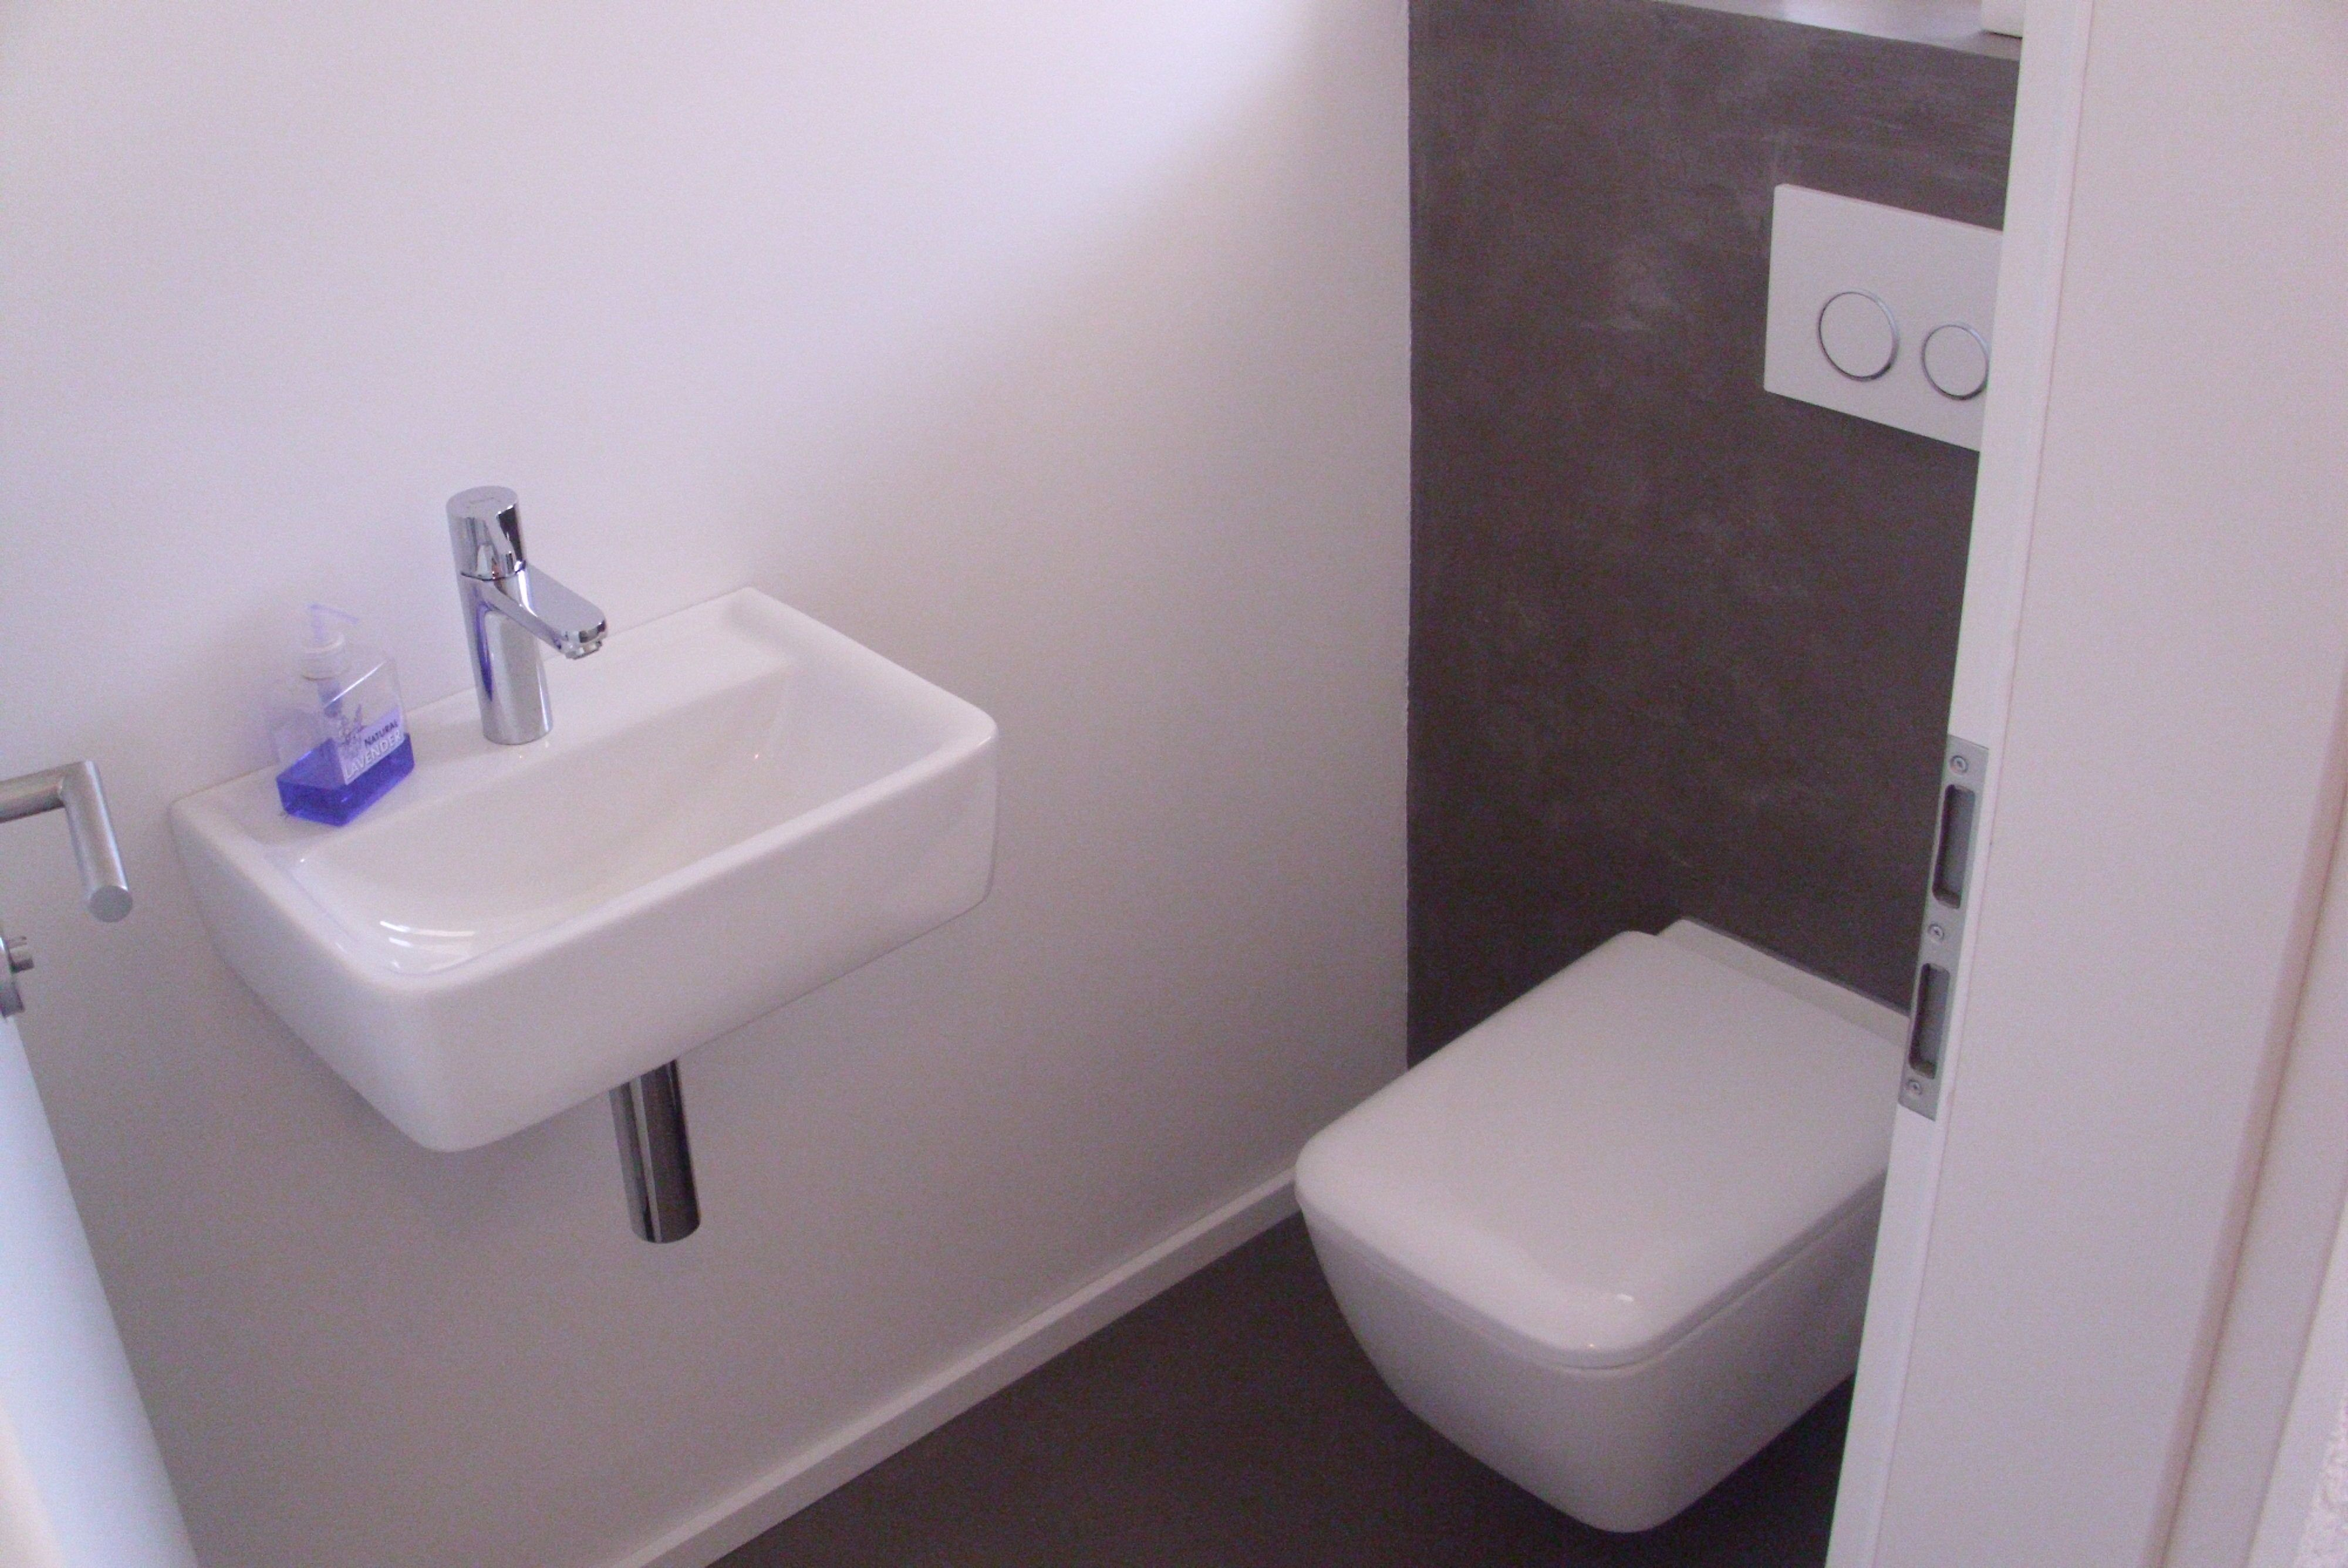 Rückwand Badezimmer ~ Wc rückwand boden betonoptik pinterest